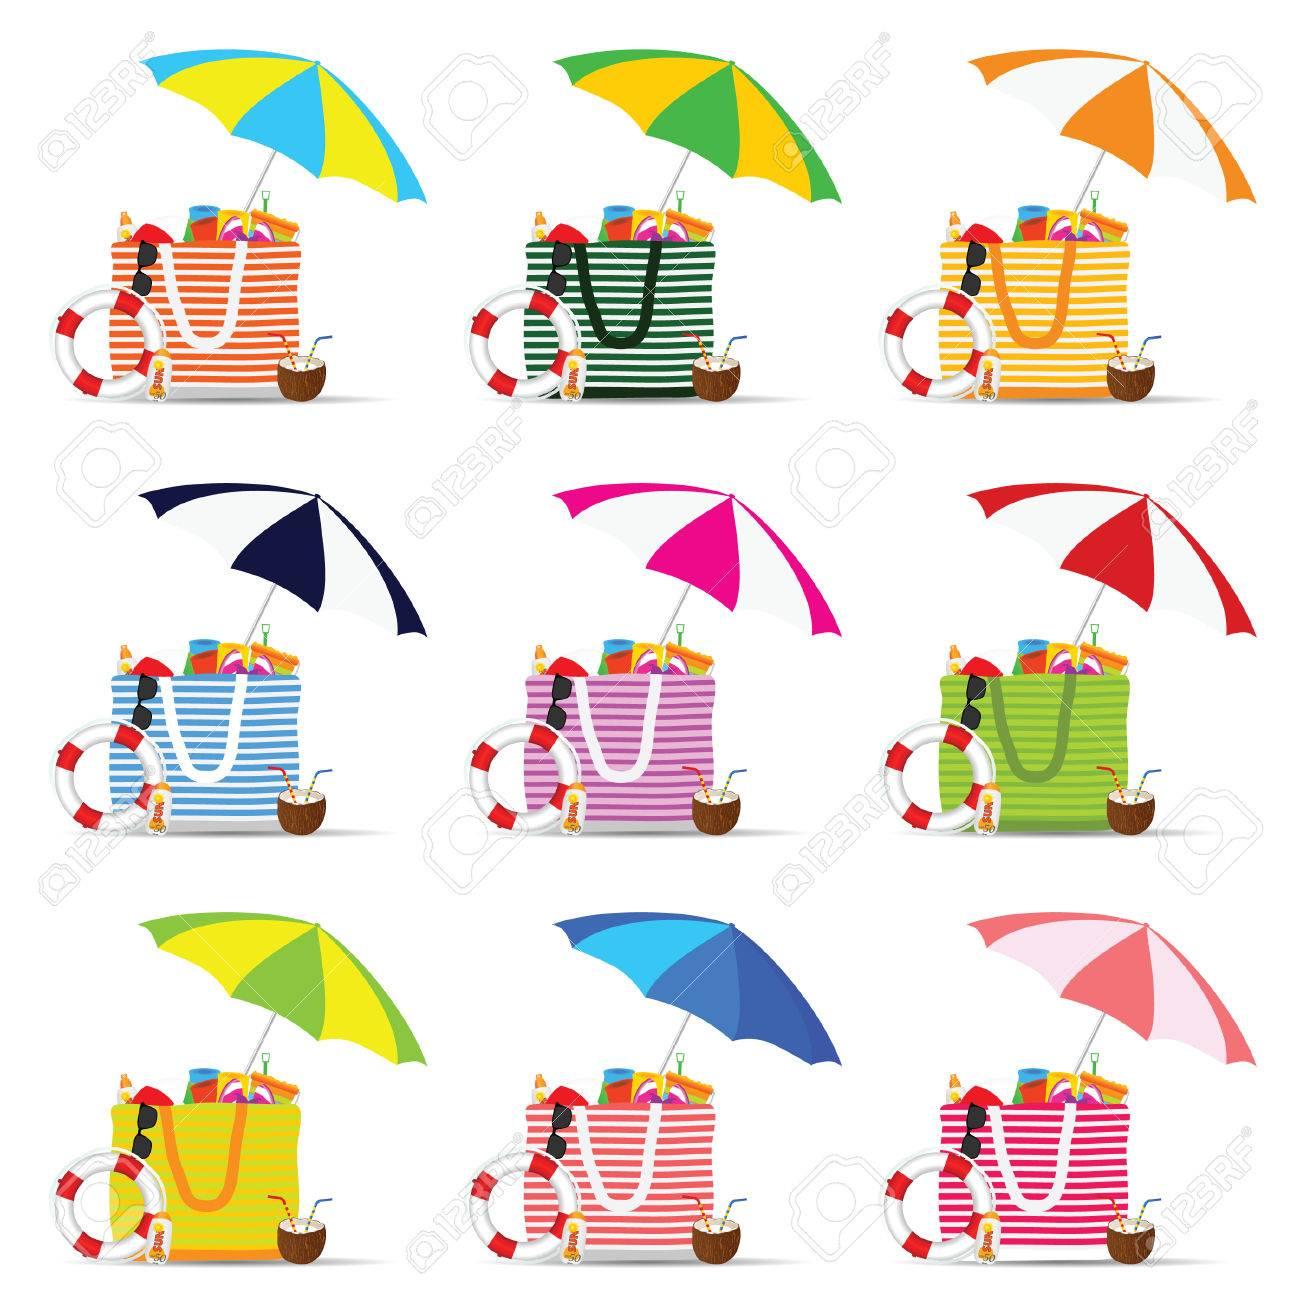 Bag For Beach With Stuff Color Set Design Illustration Royalty Free ...